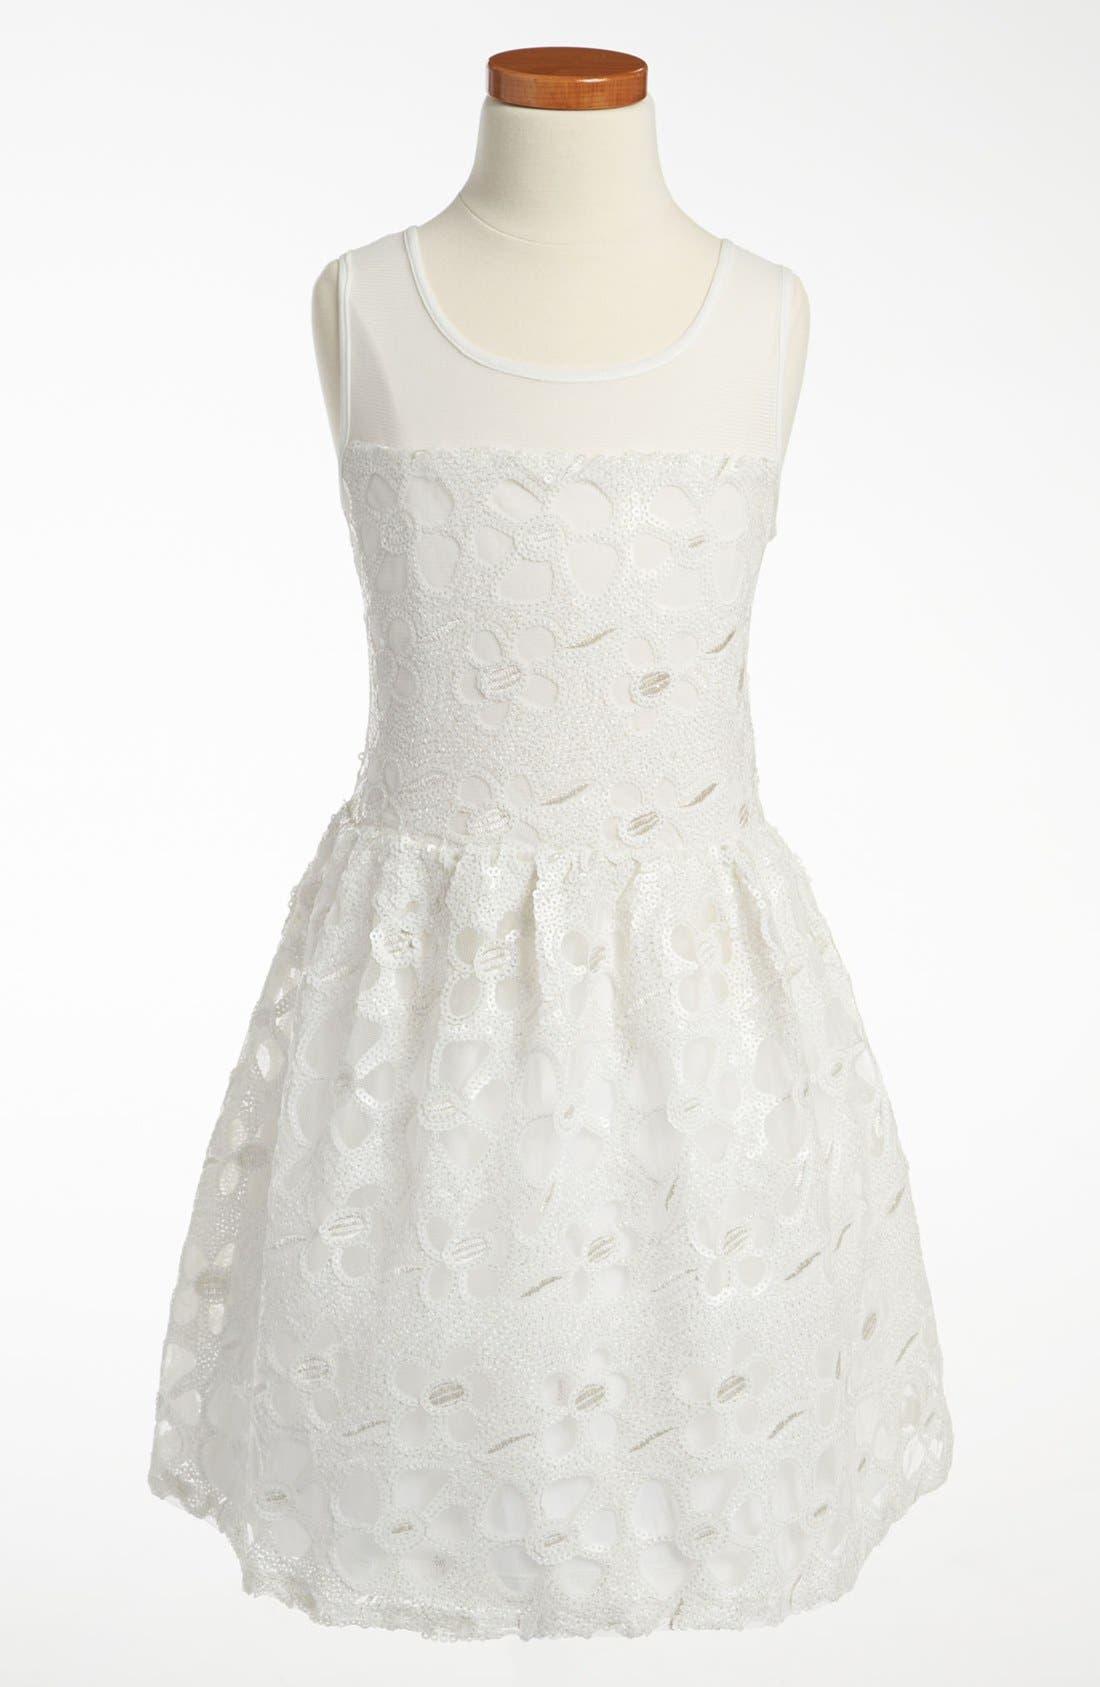 Main Image - Elisa B 'Daisy's Daisies' Dress (Big Girls)